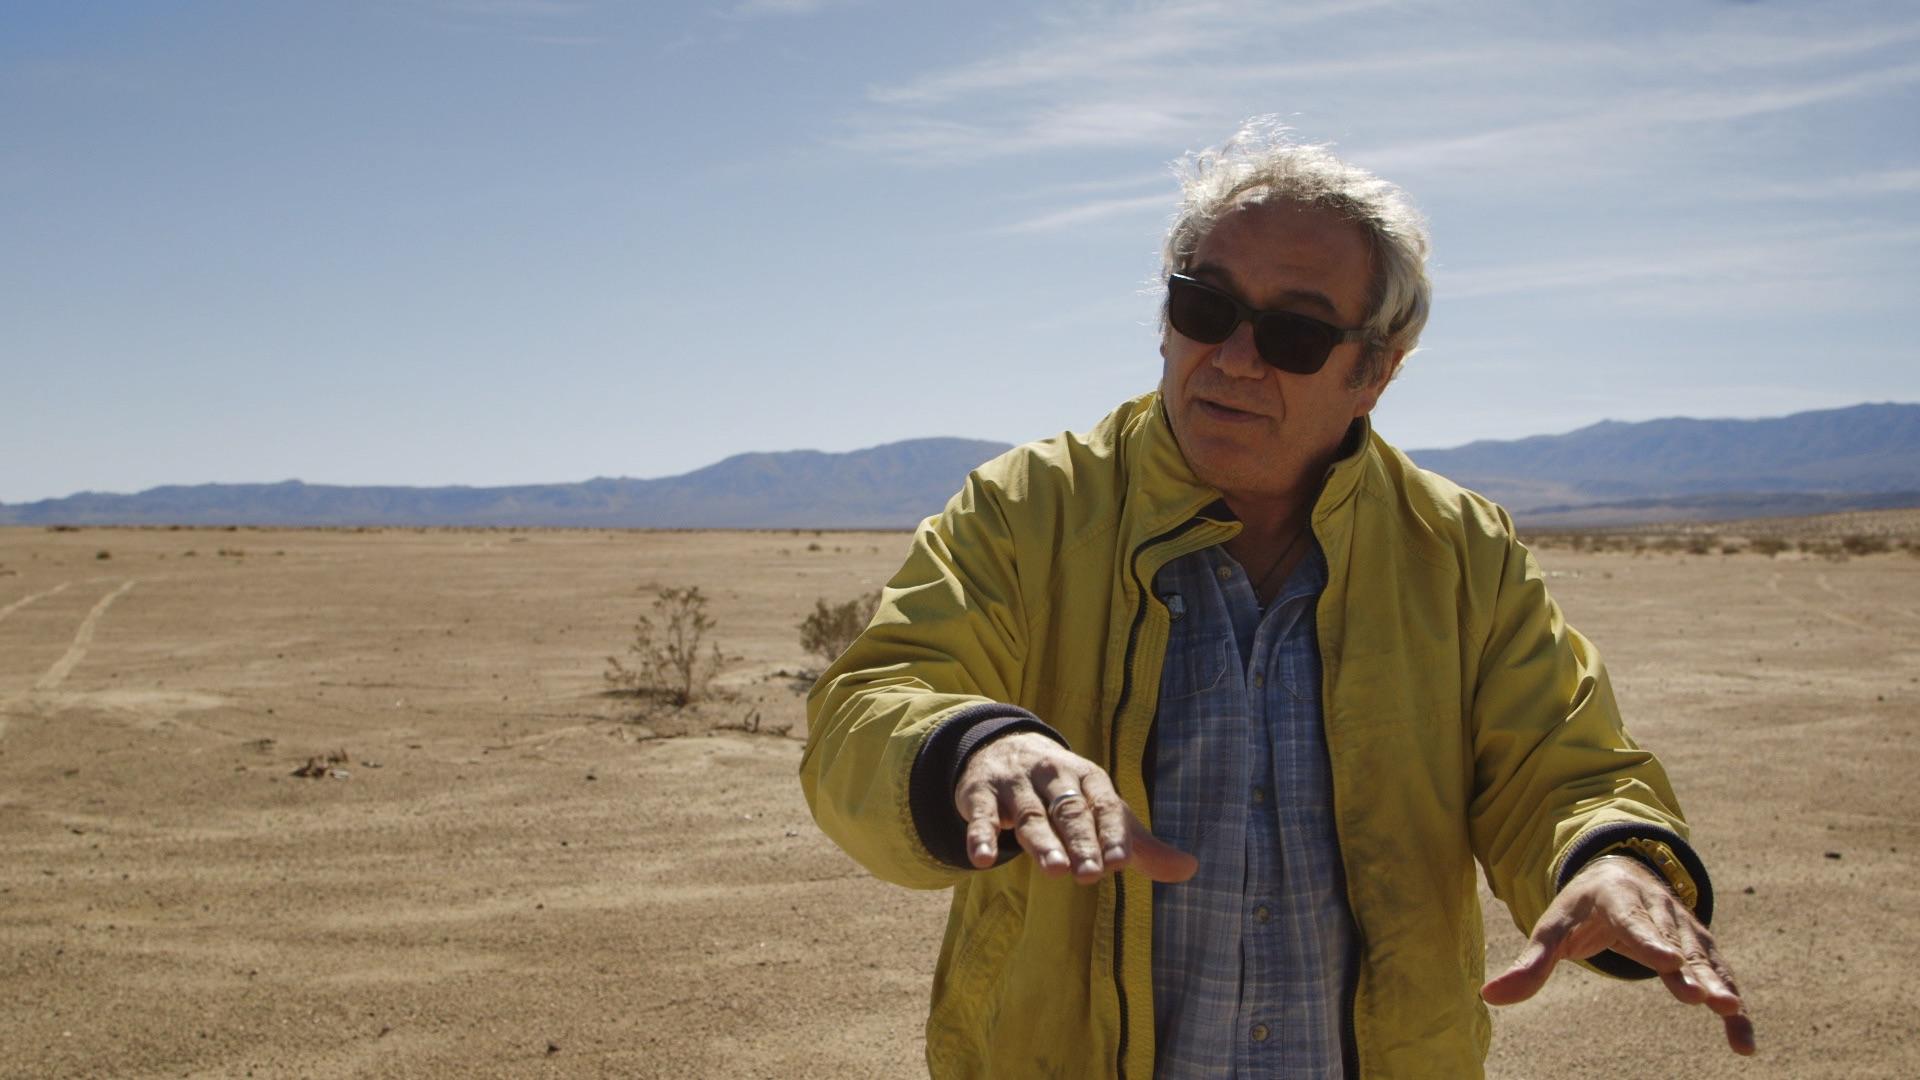 Present Day Mike Watt of Minutemen explains things that happened in the desert